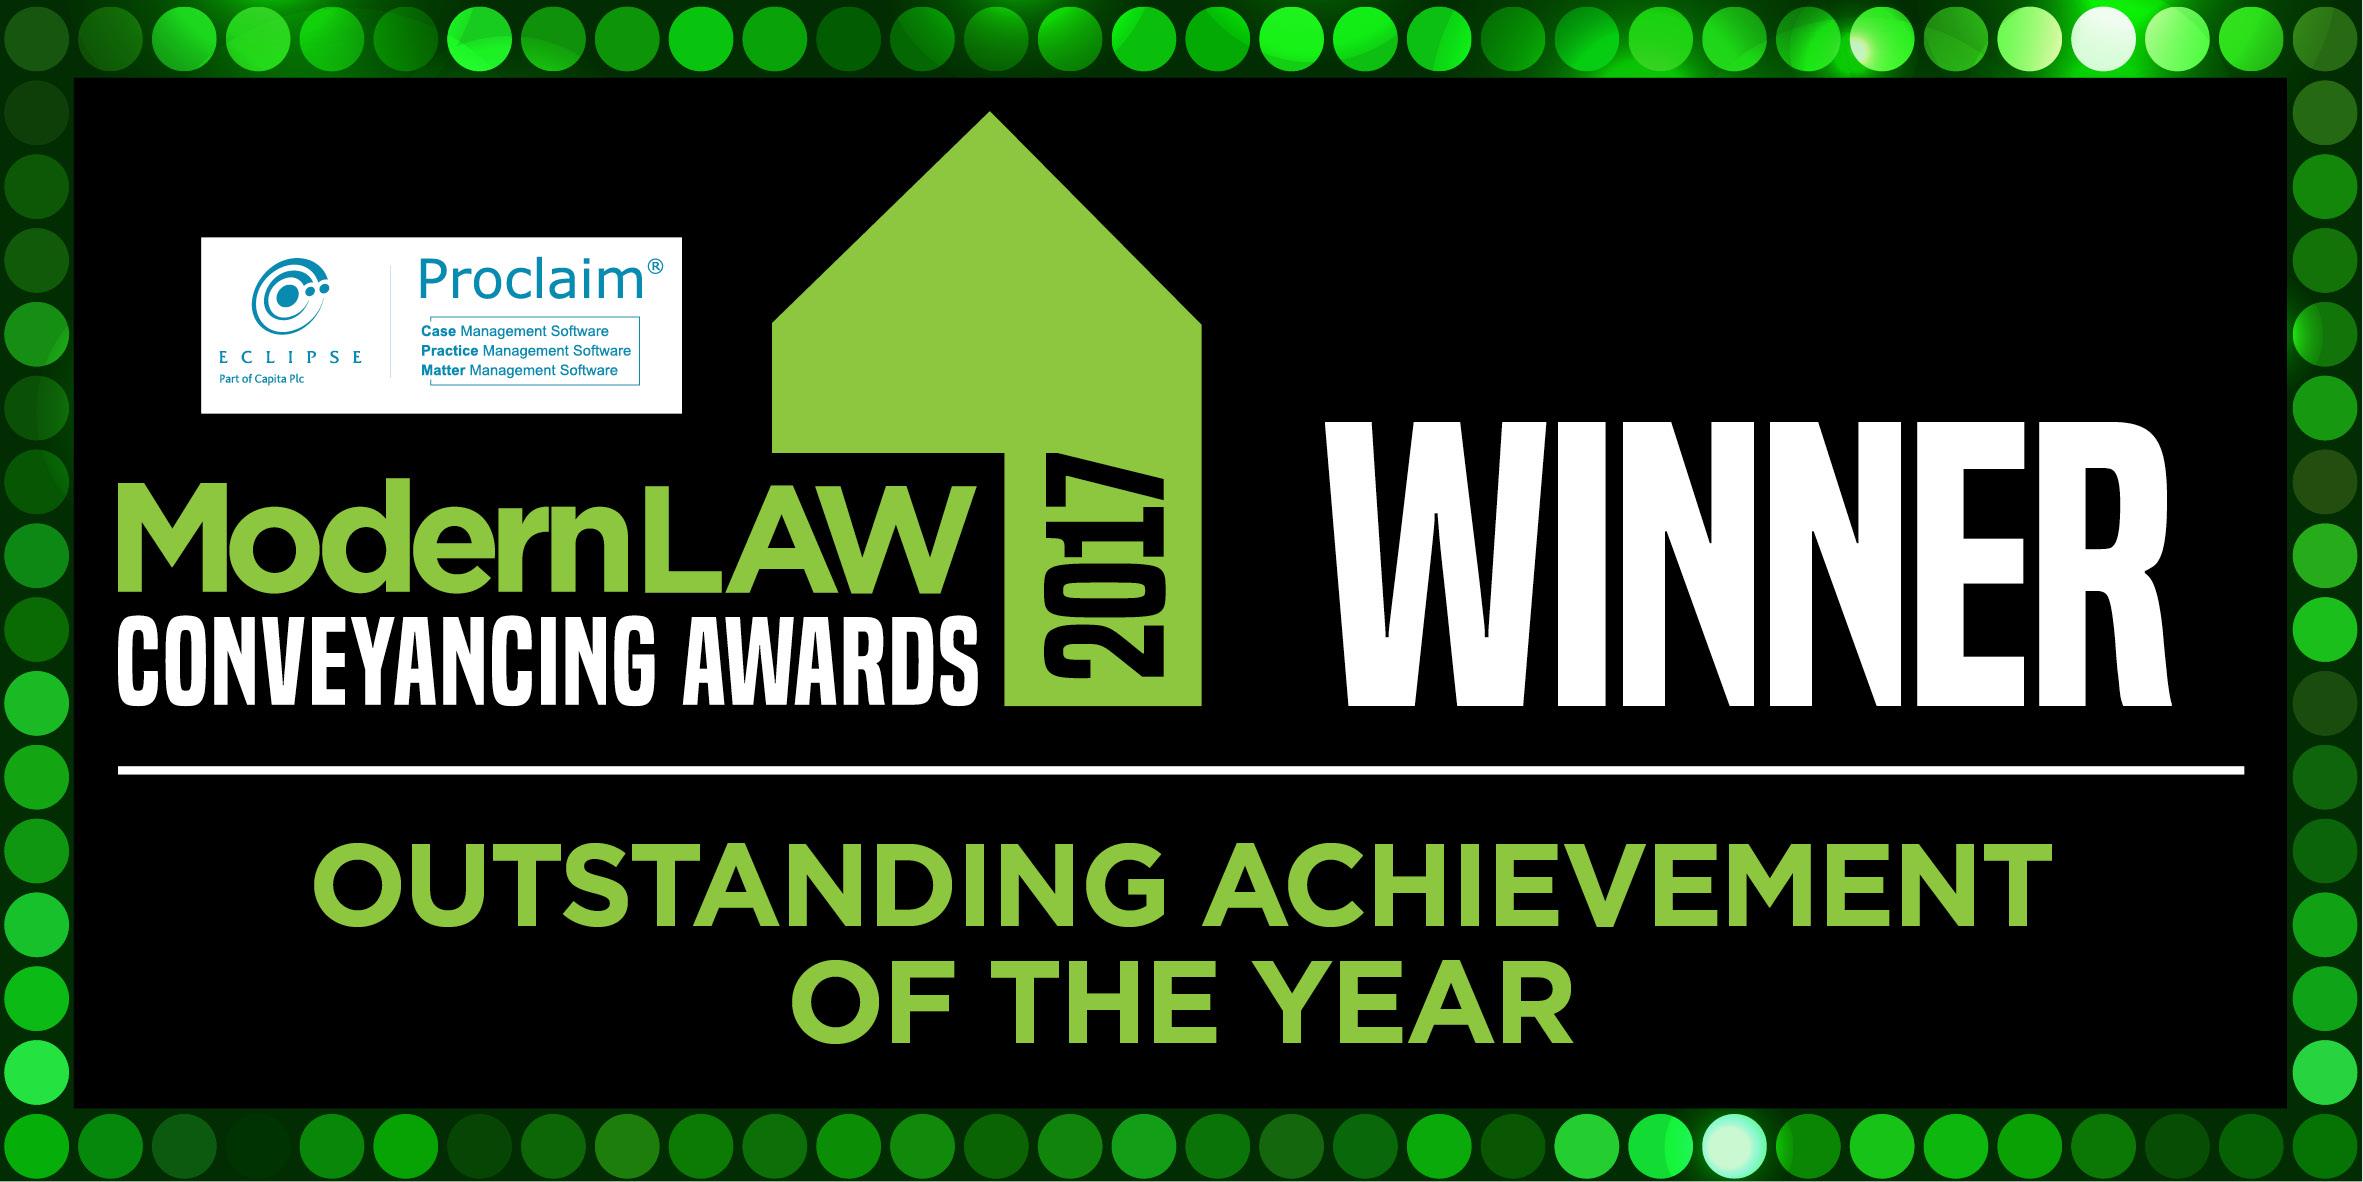 Modern Law Conveyancing Awards 2017 Winner 14.jpg